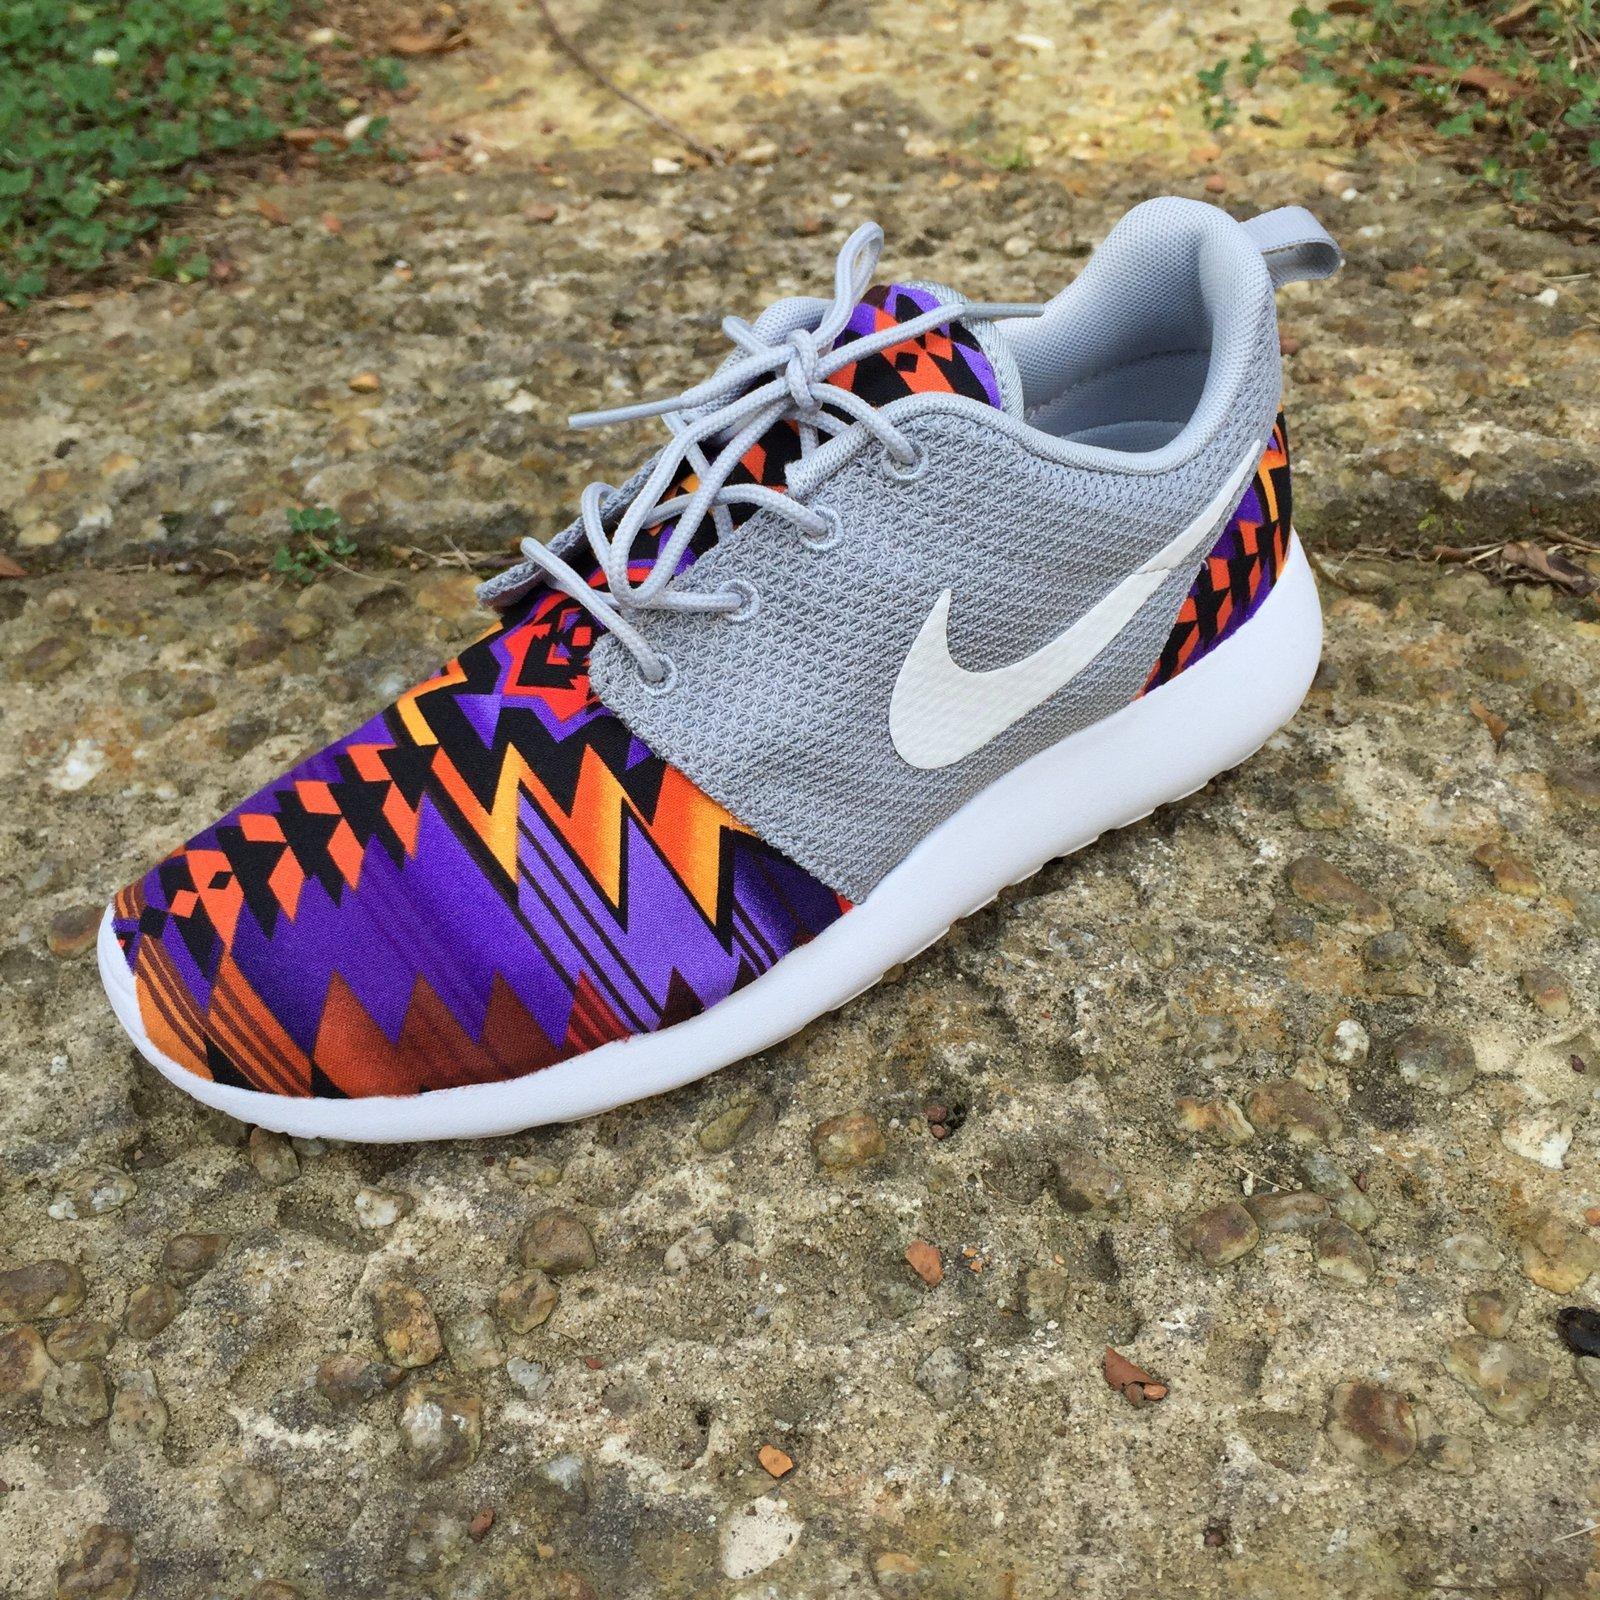 Image of Custom Nike Roshe One